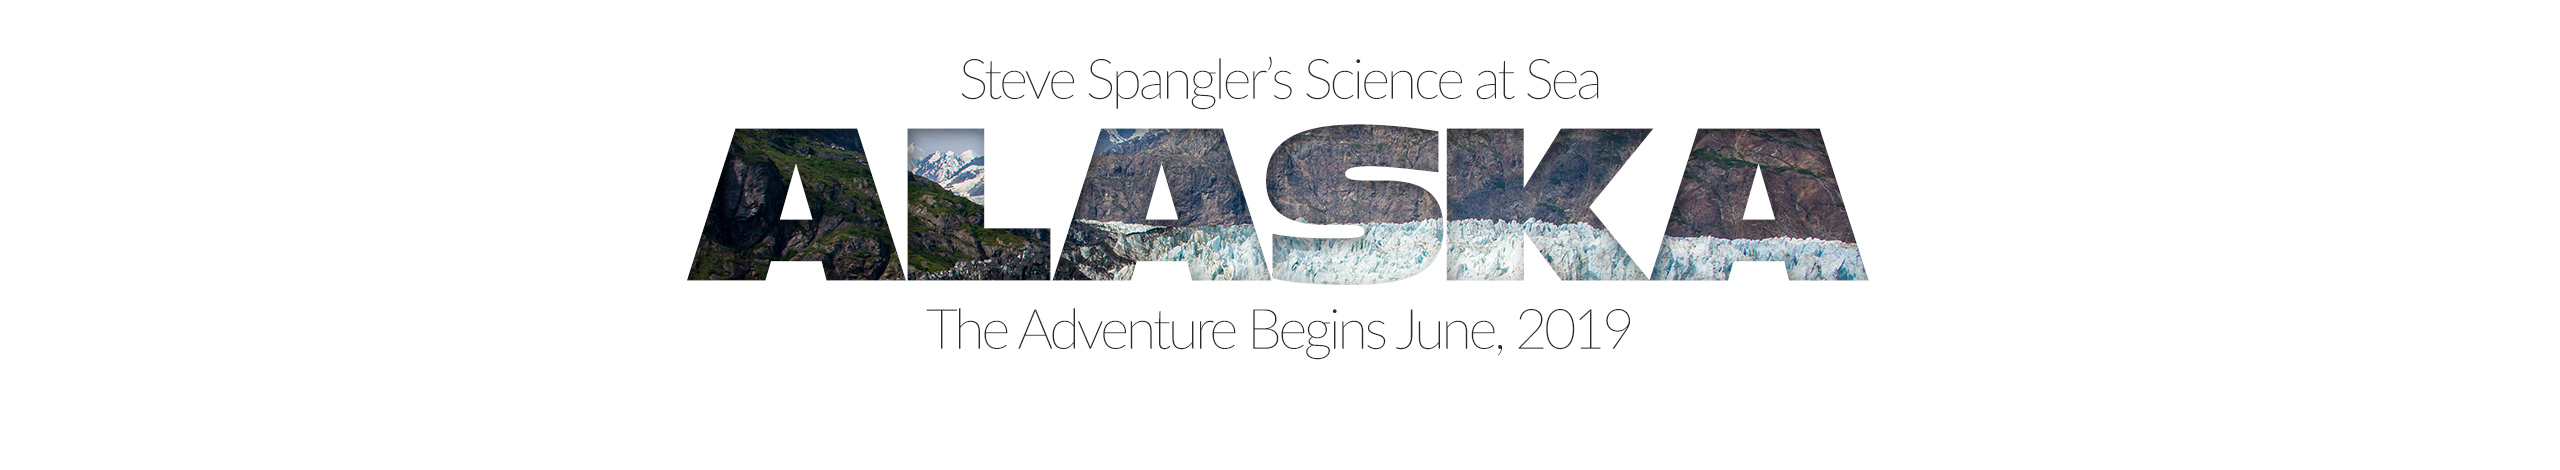 Science at Sea with Steve Spangler 2019 Alaska